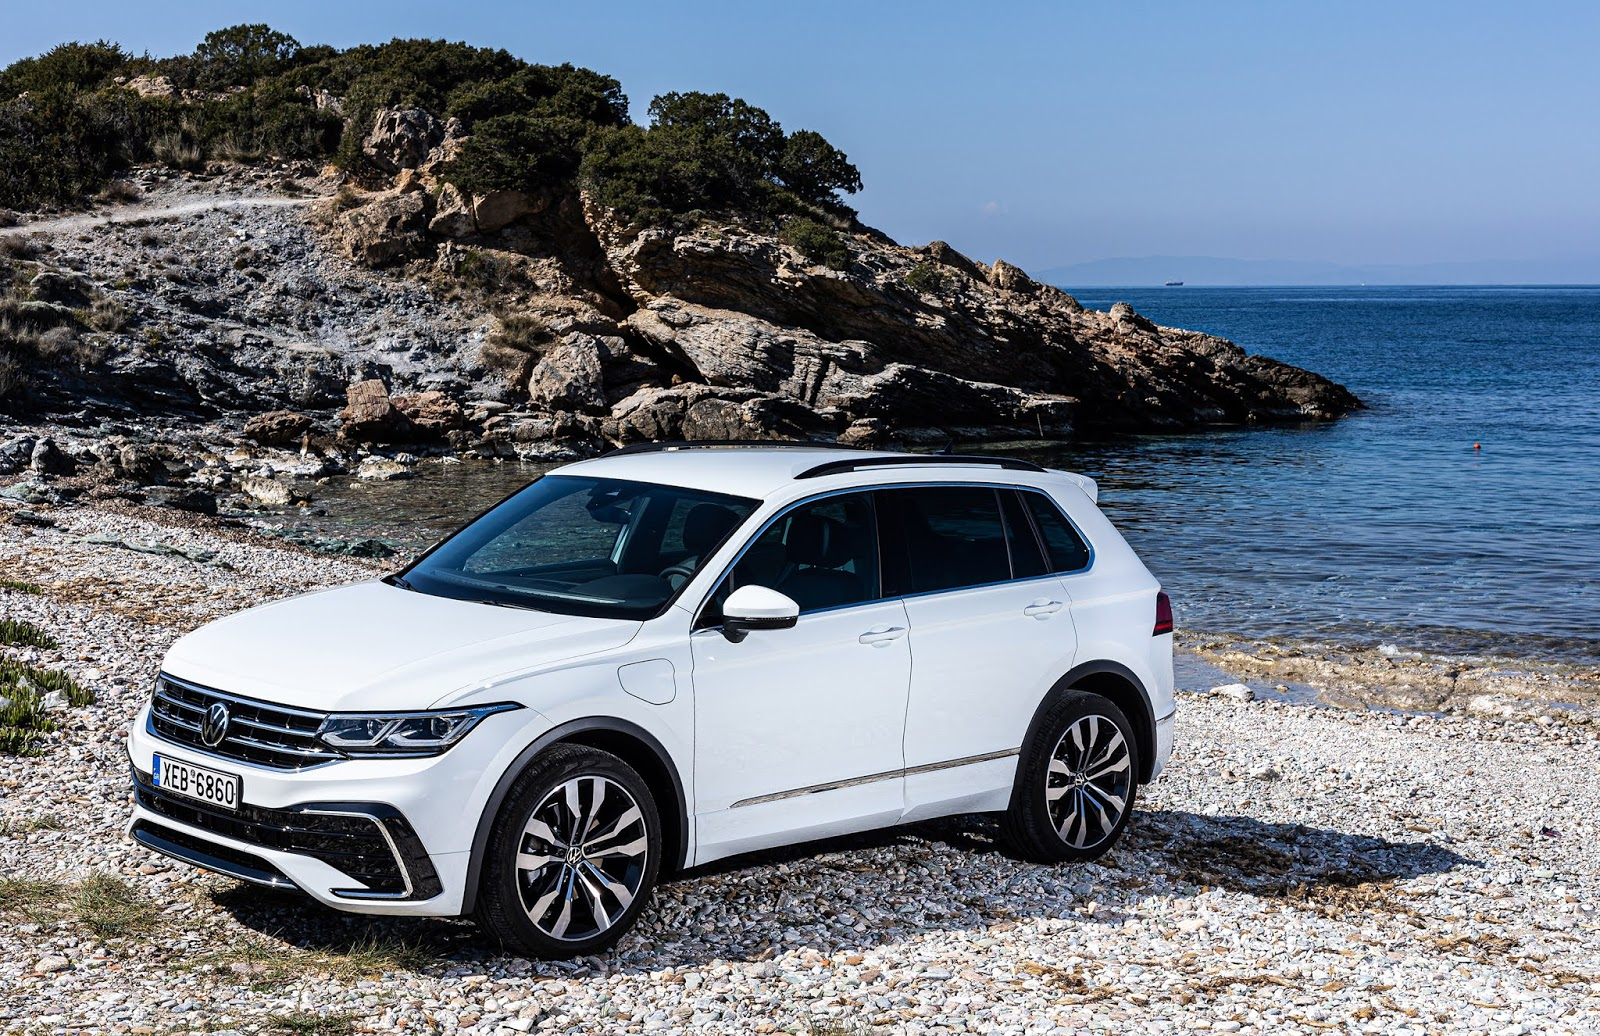 NEW2BVOLKSWAGEN2BTIGUAN 9 1 Από 25.760€, το νέο Volkswagen Tiguan Volkswagen, Volkswagen Tiguan, VW, VW Tiguan, ειδήσεις